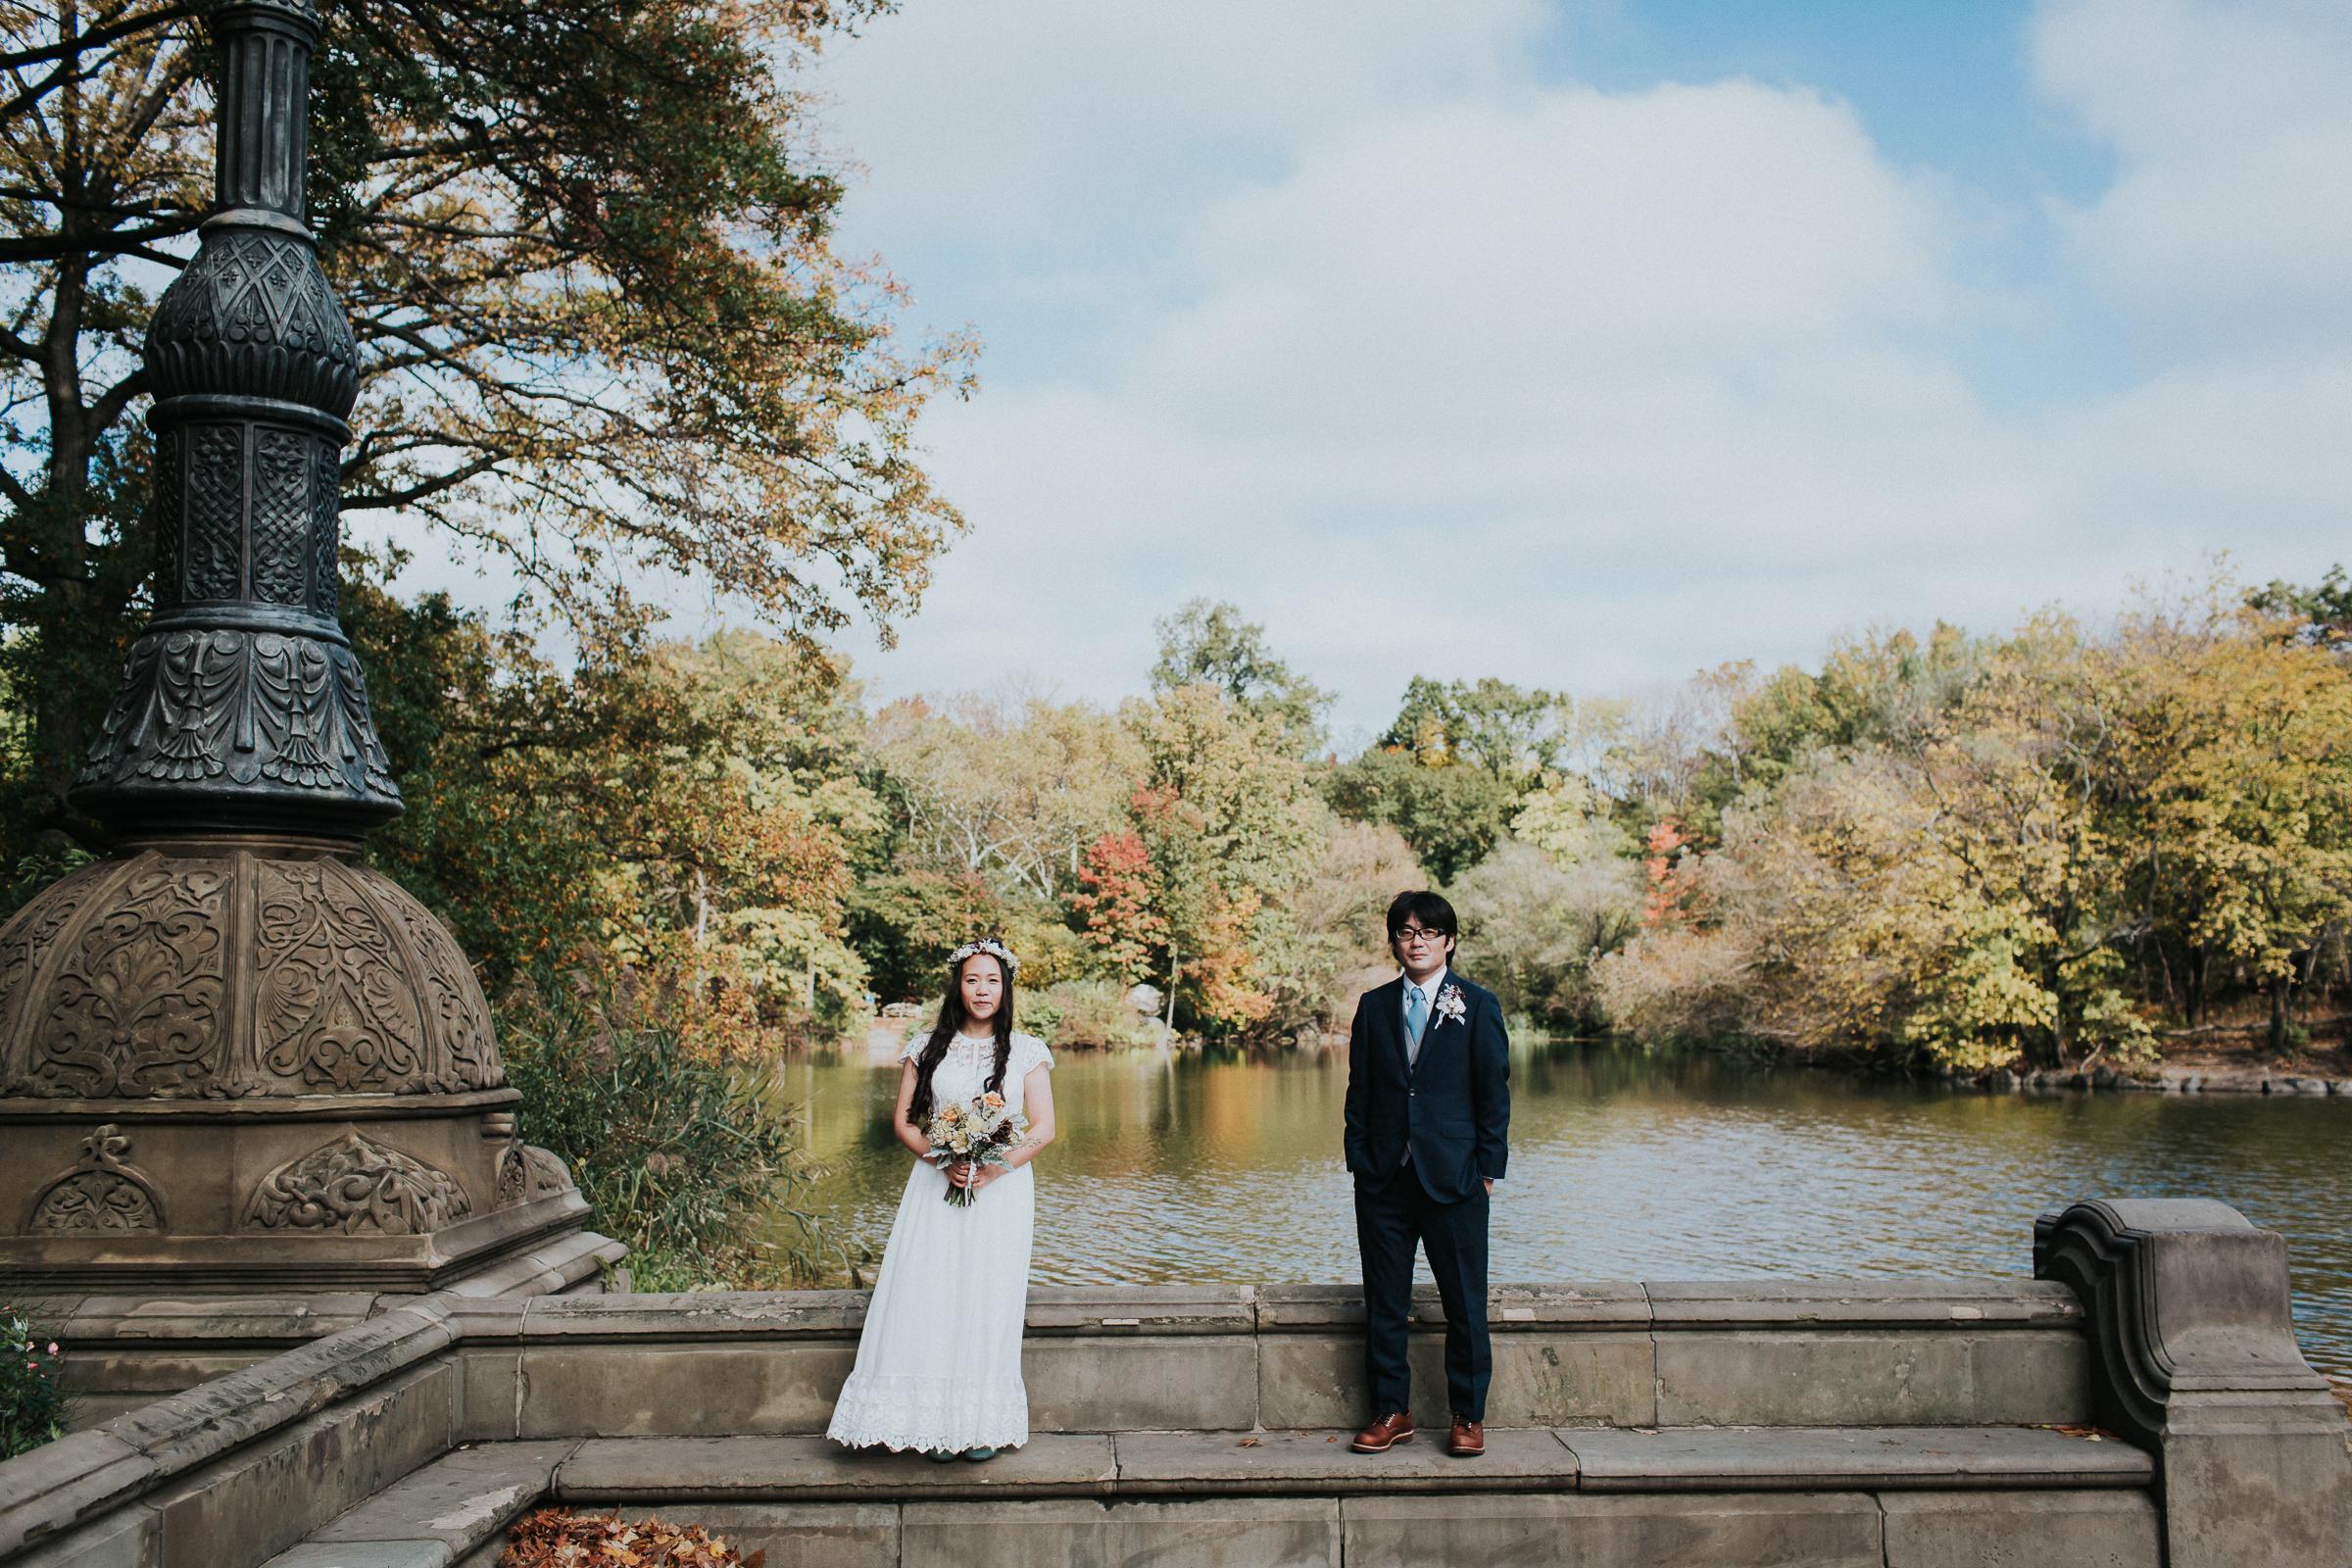 Central-Park-Brooklyn-Bridge-Dumbo-NYC-Documentary-Wedding-Photographer-39.jpg